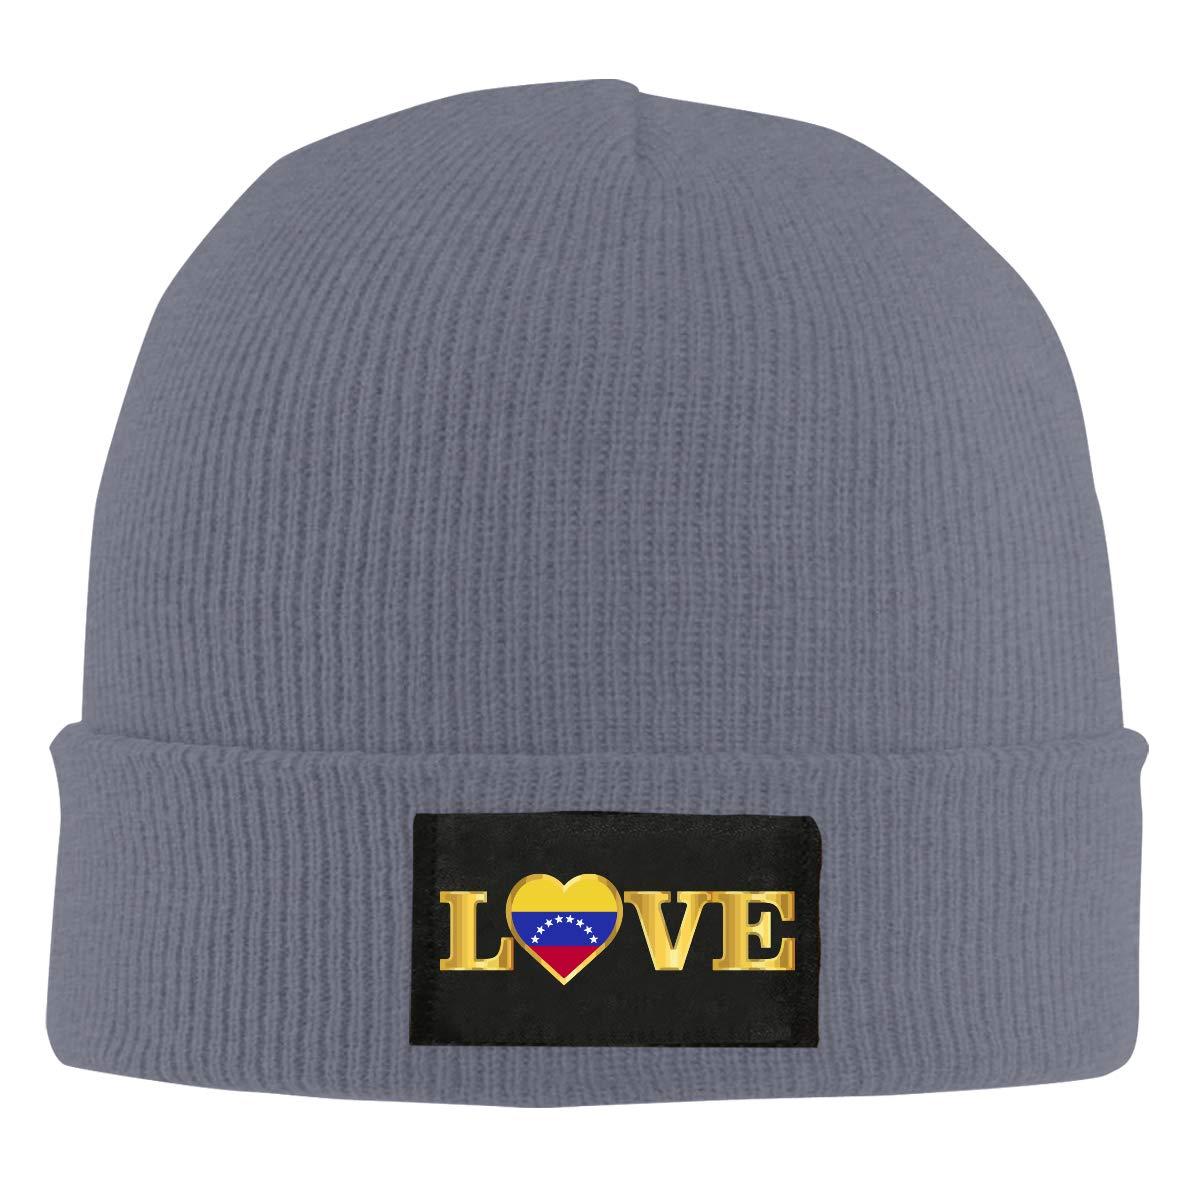 I Love Venezuela National Pride Unisex Winter Printed Warm Knitting Hats Skull Cap